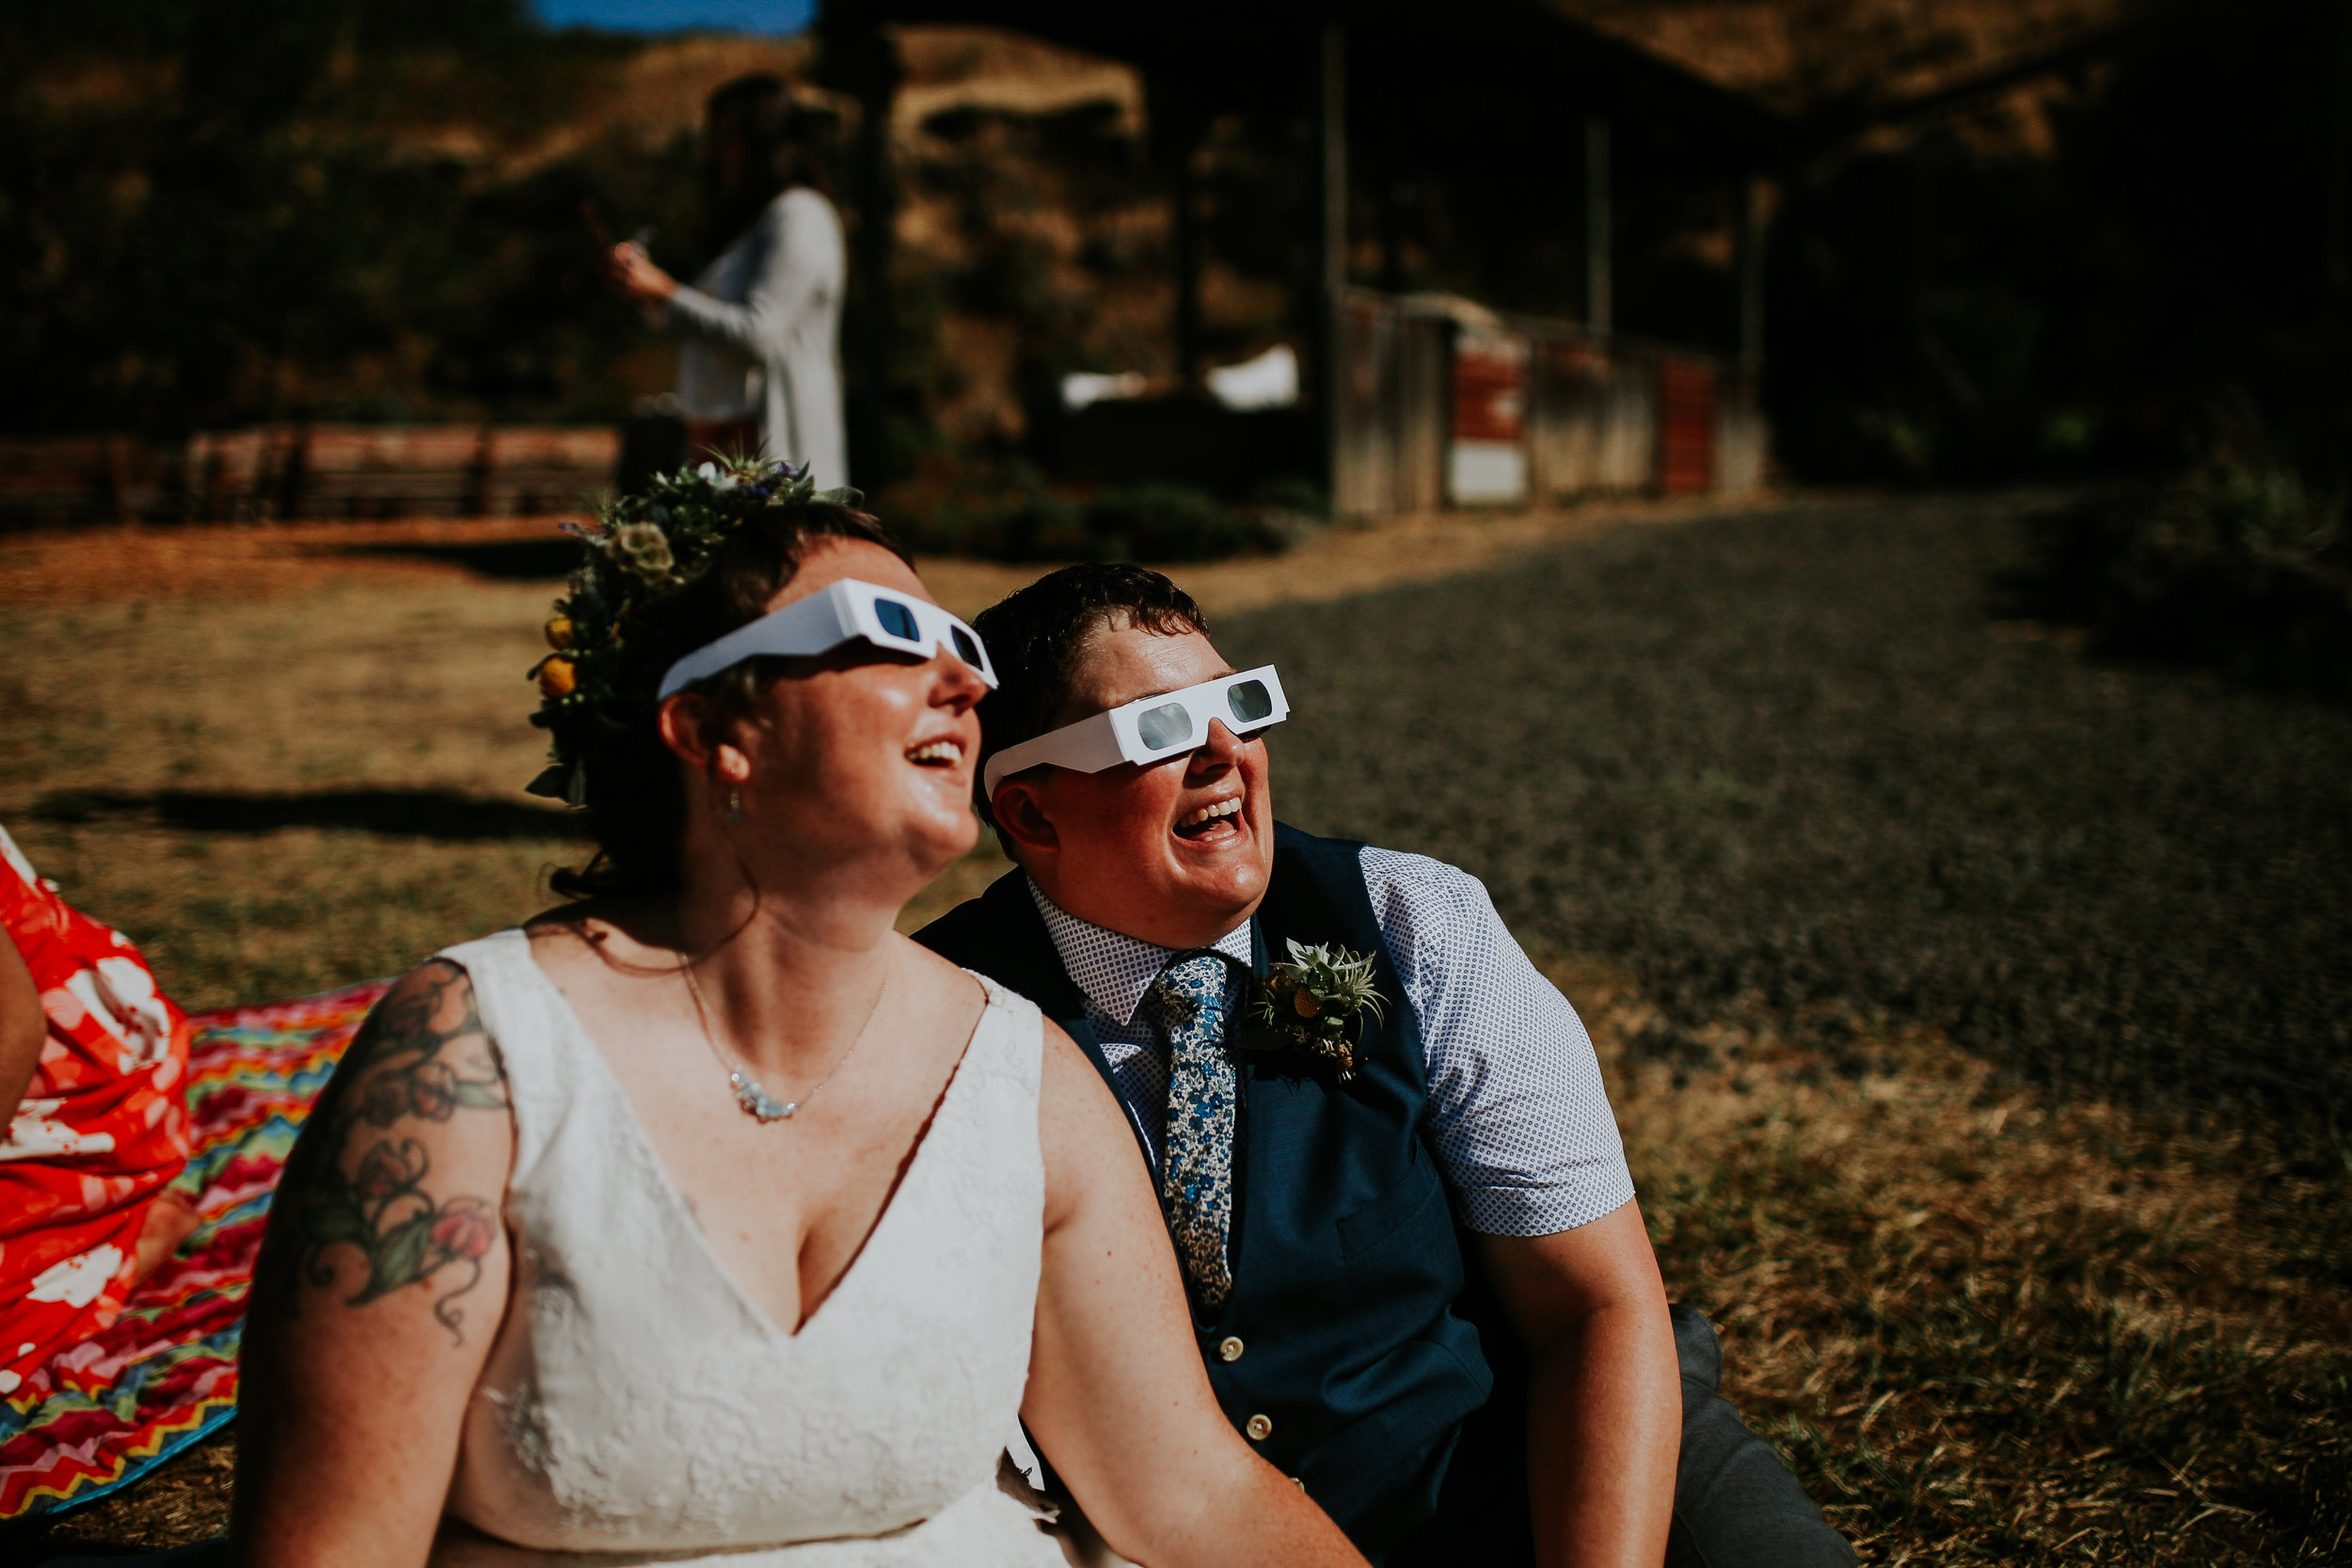 eclipse-wedding-kt-bdub-portland-jamiecarle-9300.jpg